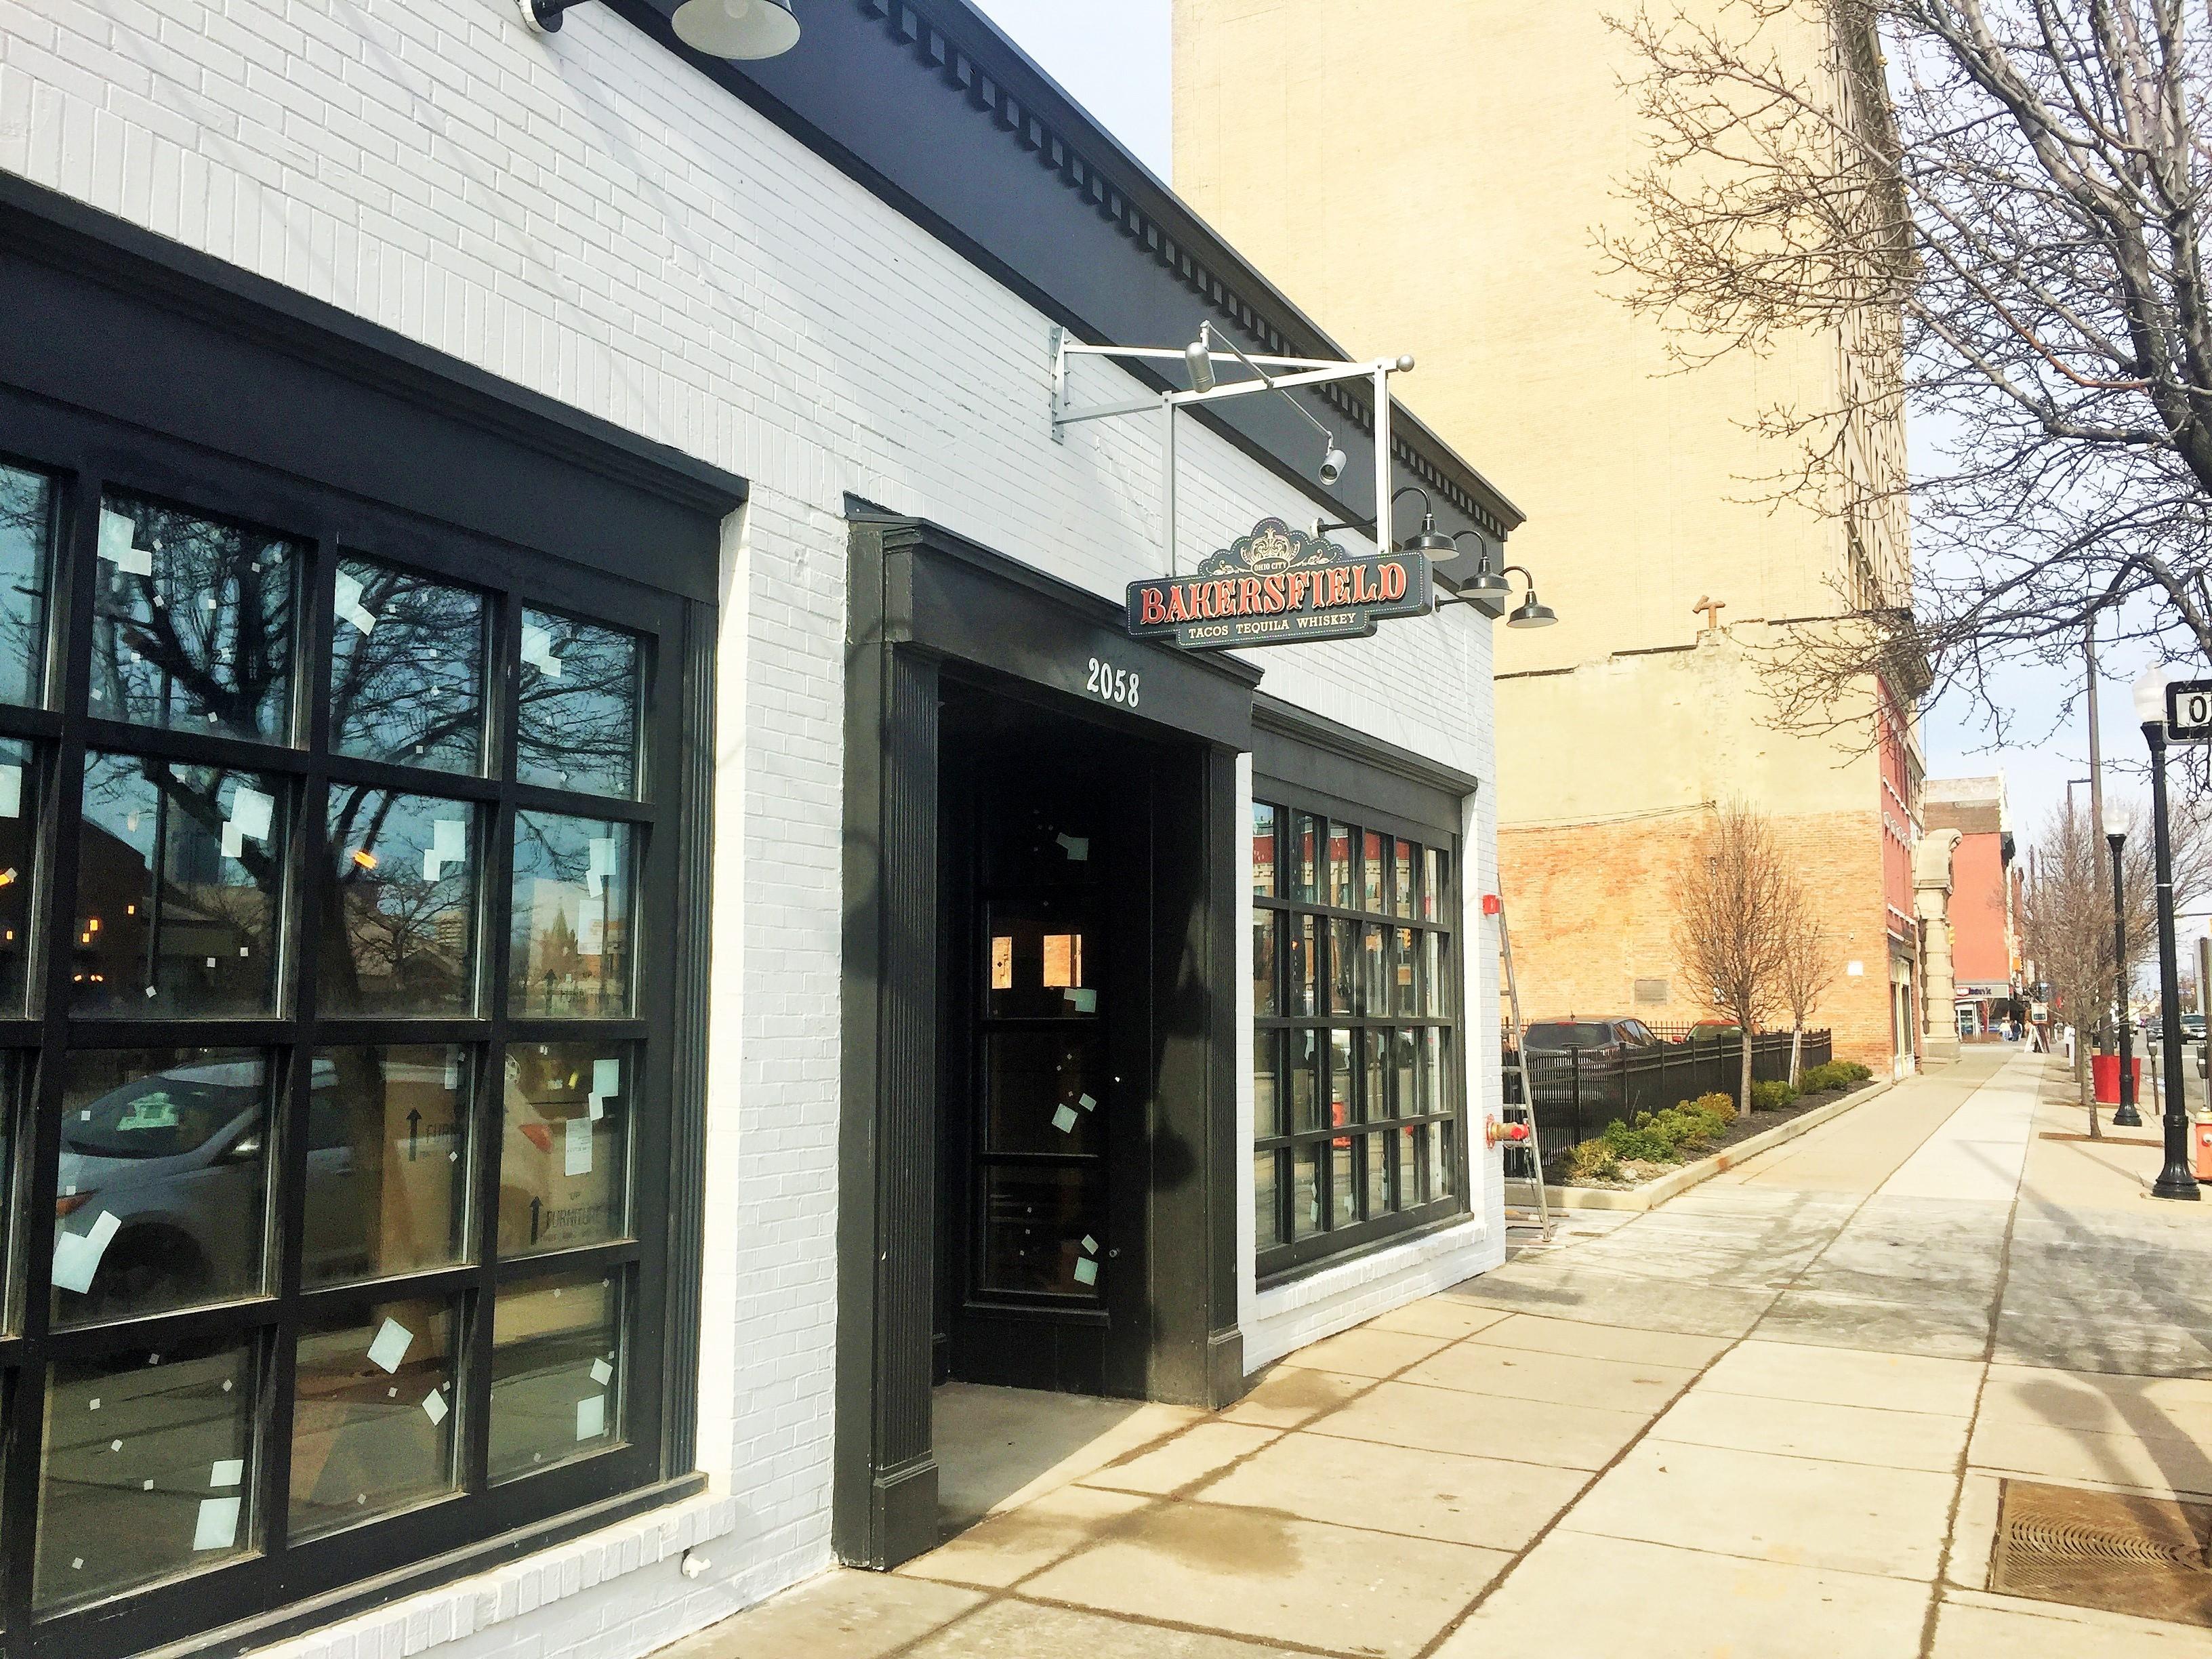 Bakersfield Restaurant Ohio City